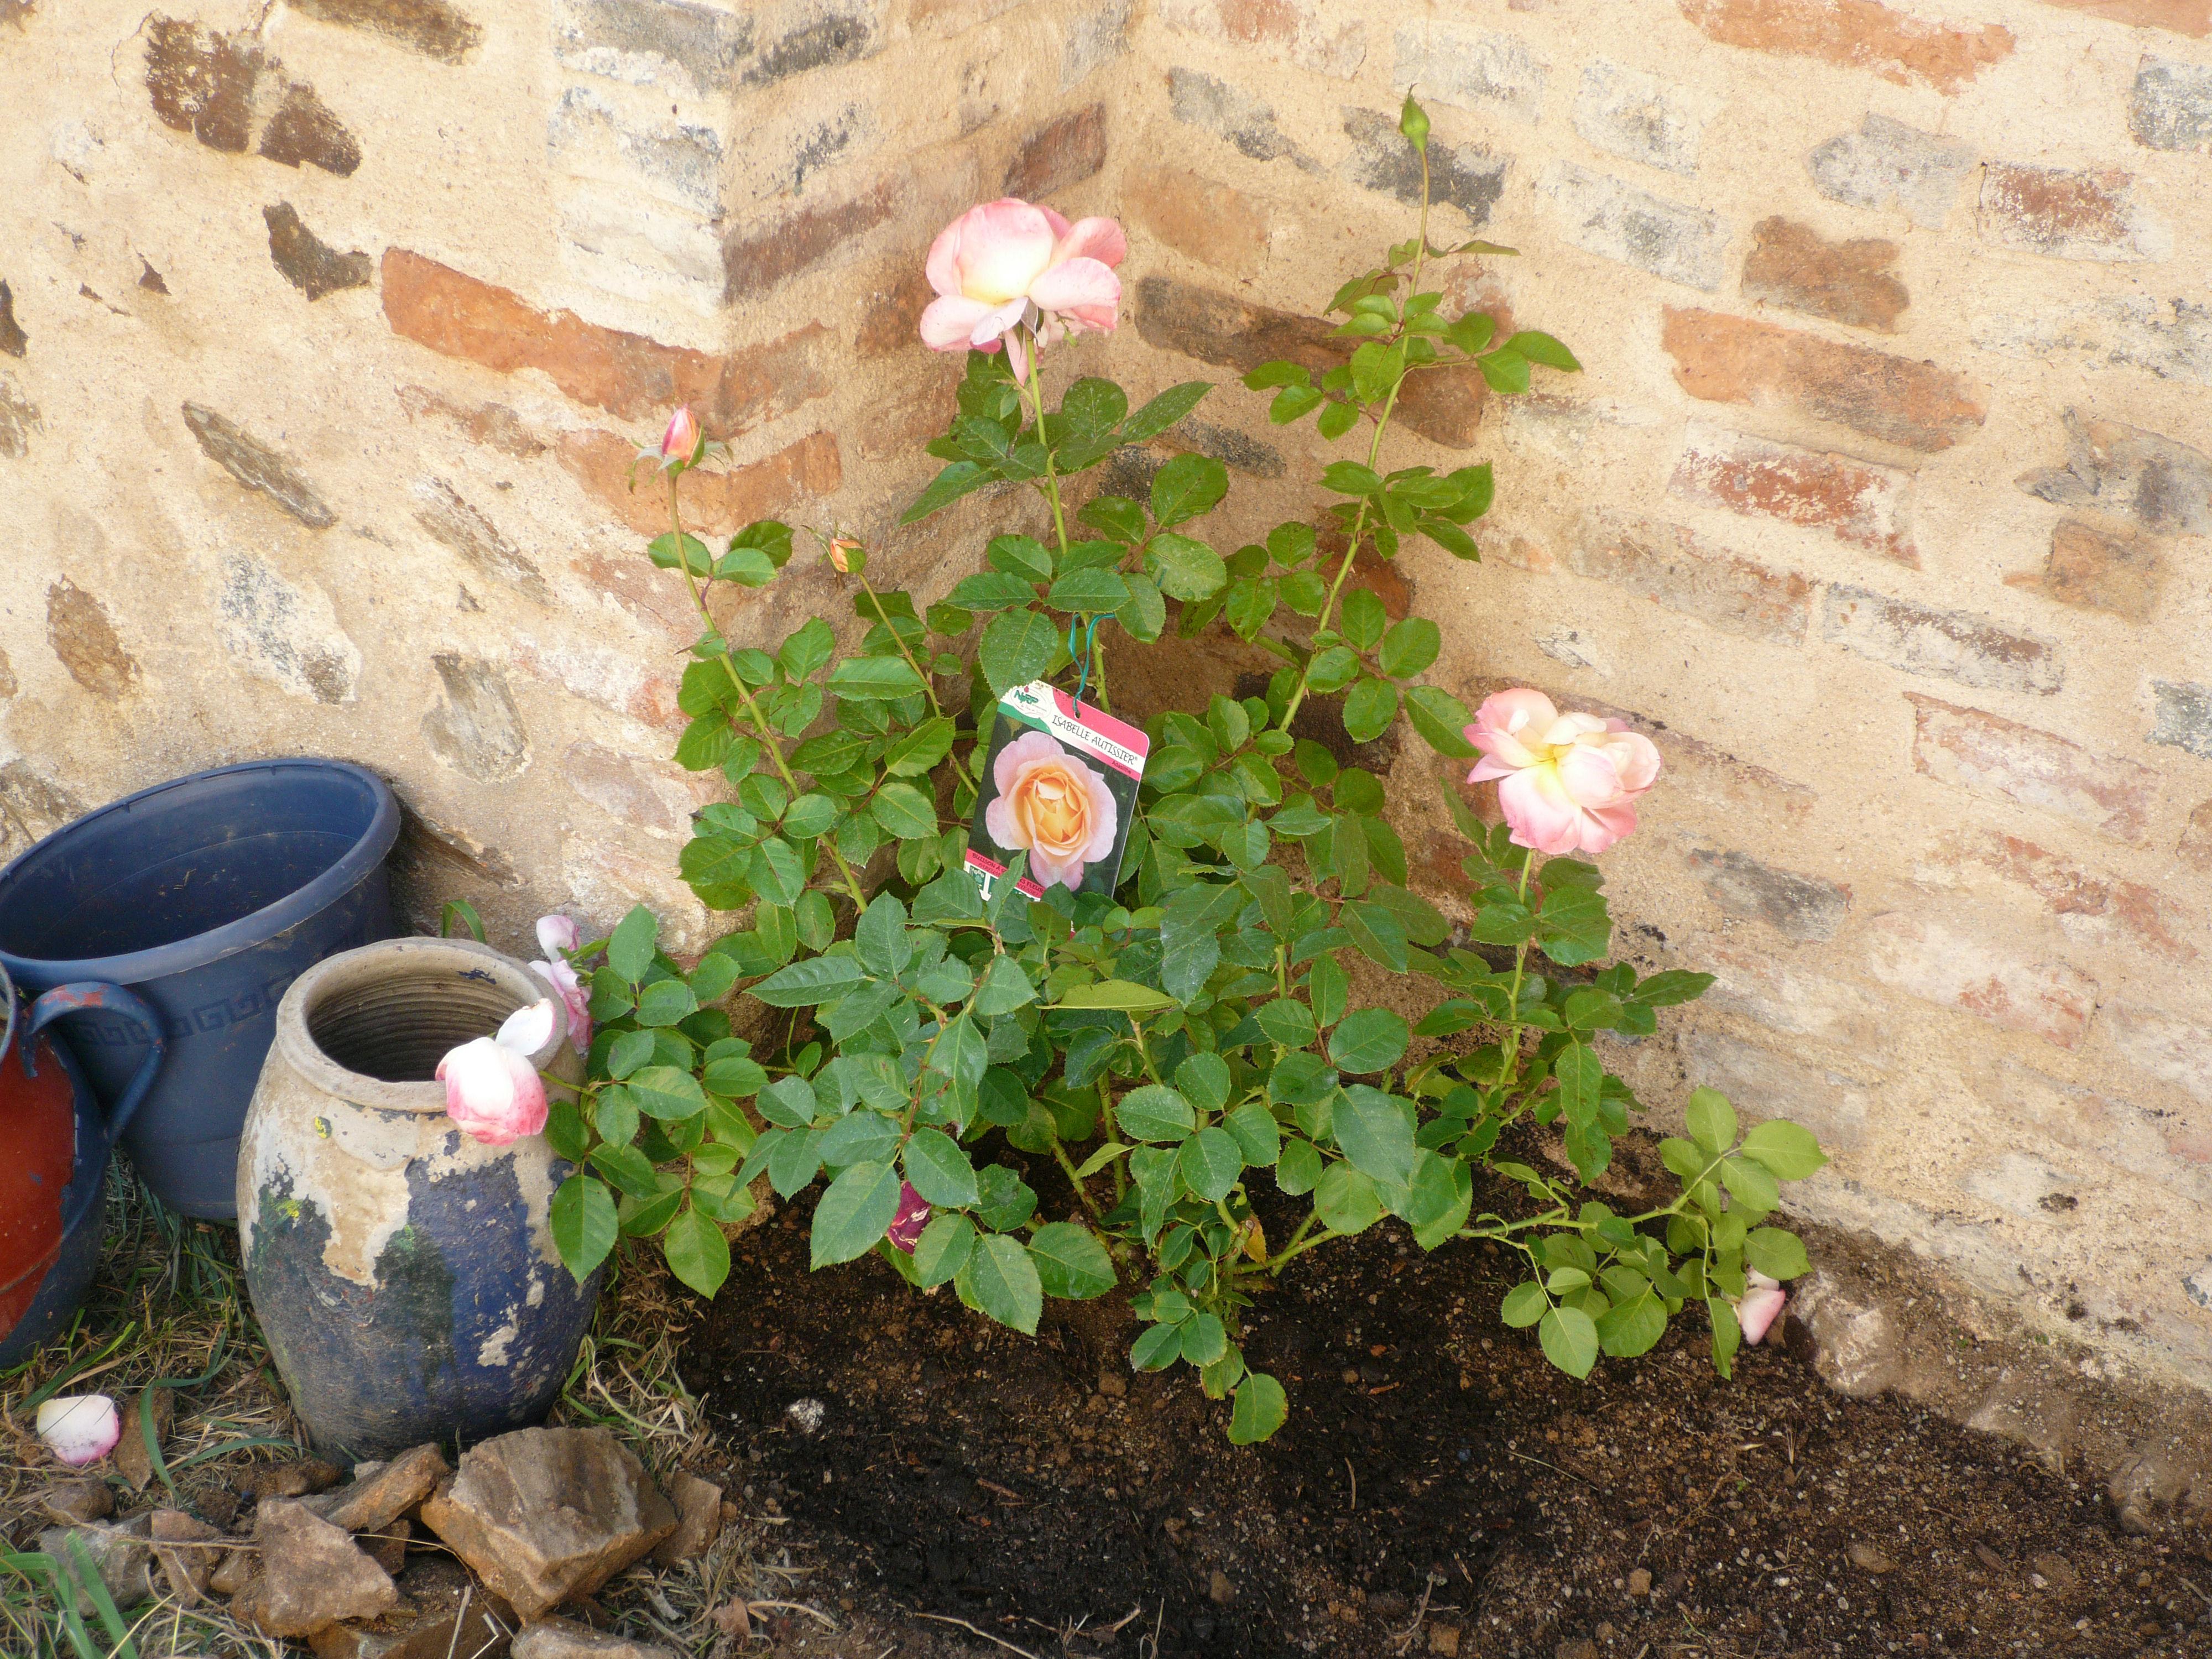 Isabelle Autissier rose